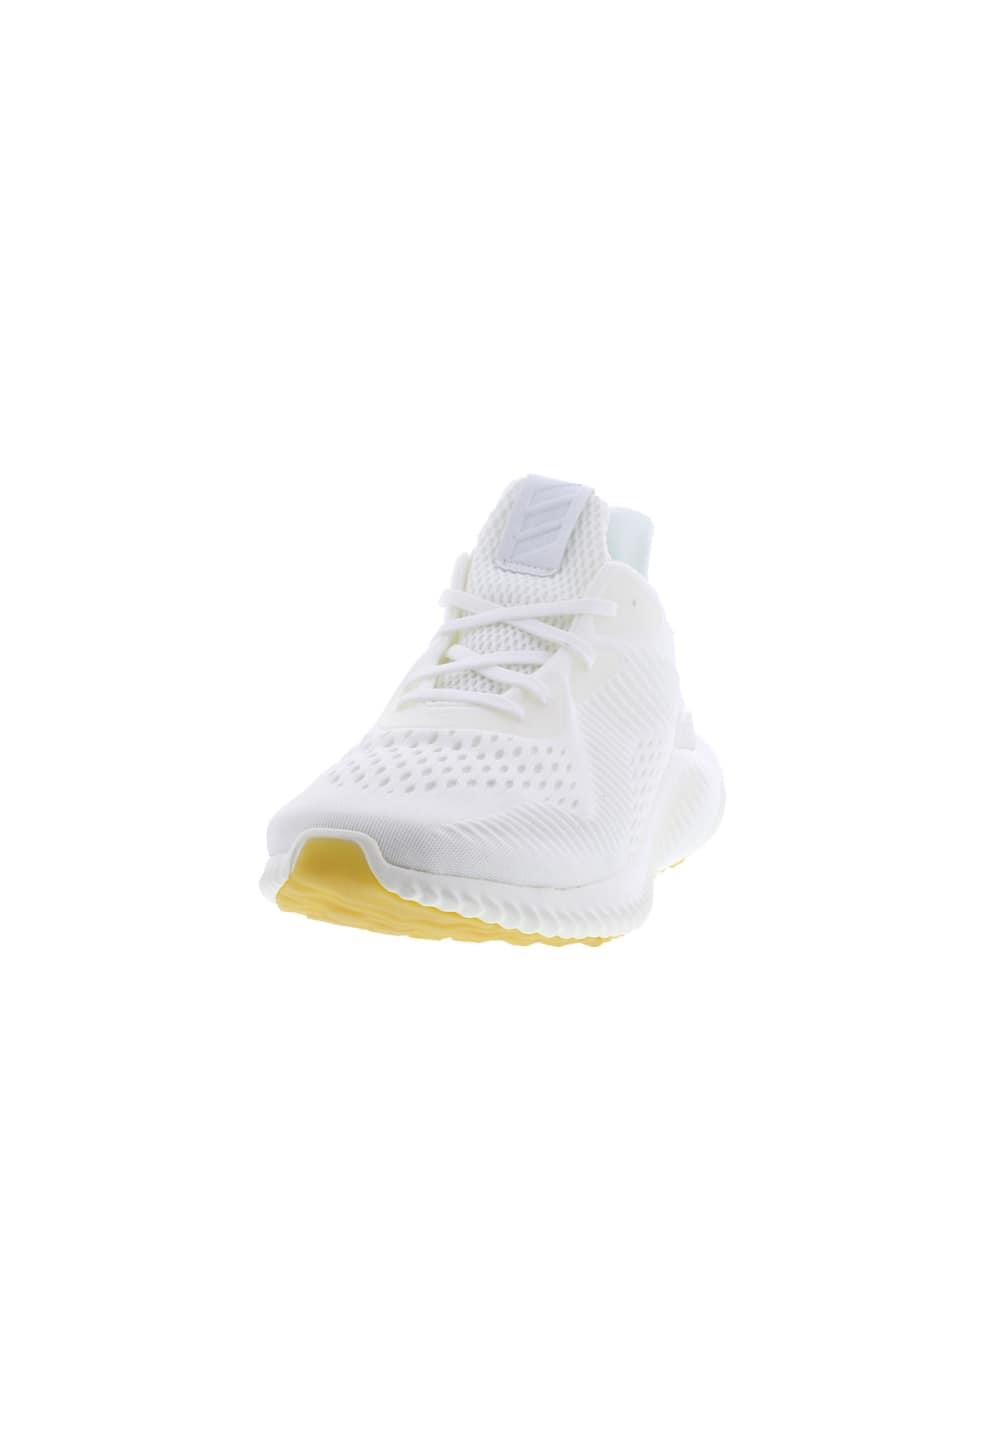 aadcd225a adidas alphabounce EM Undye - Running shoes for Men - White